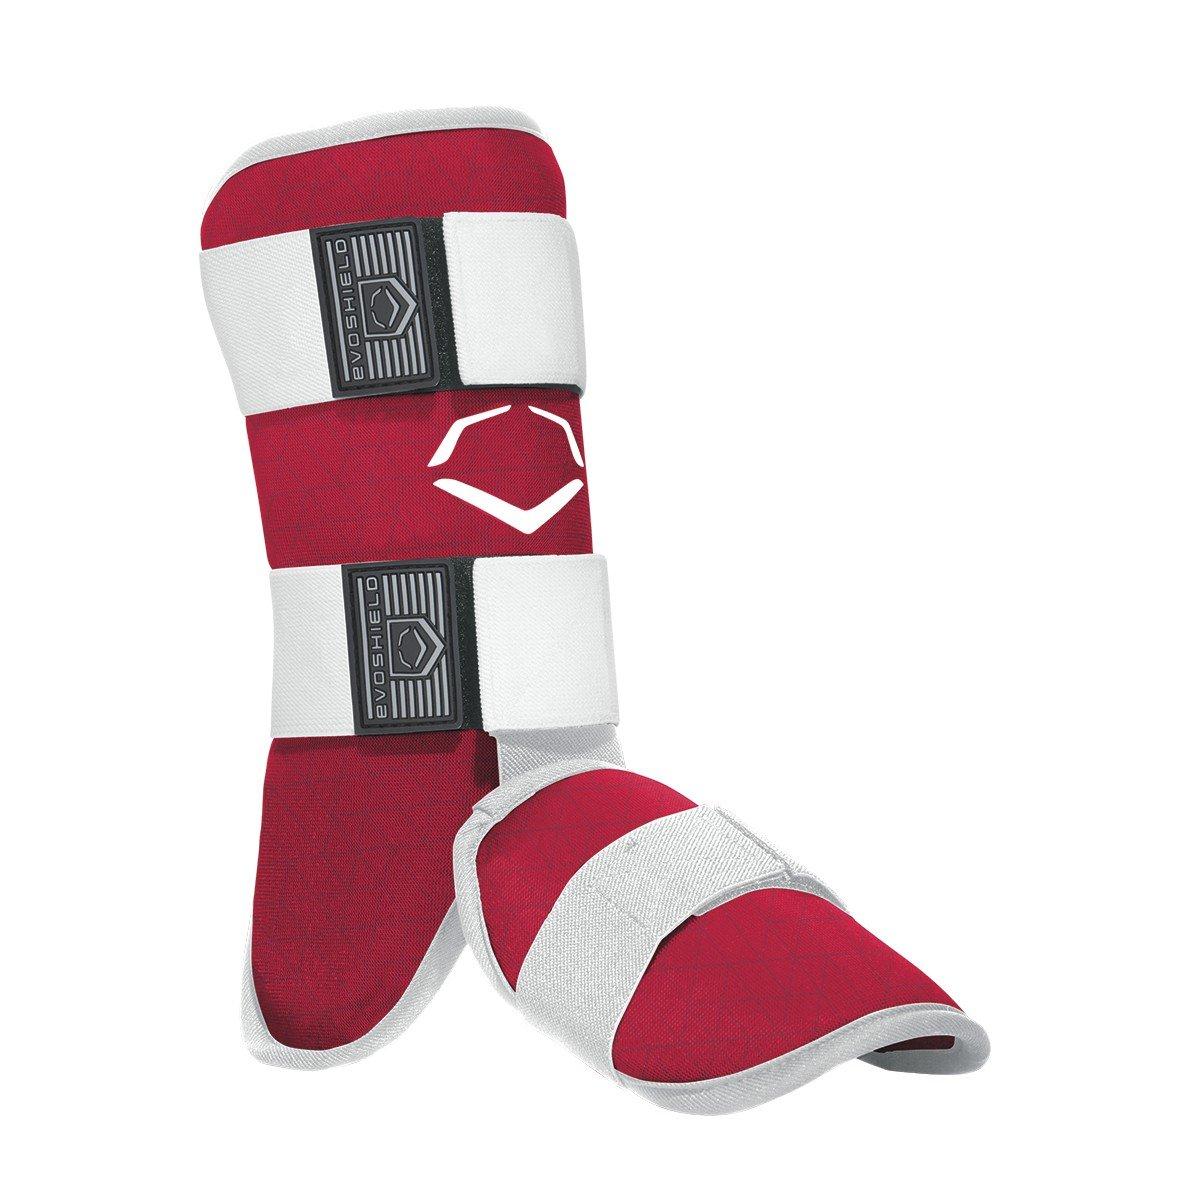 EvoShield EvoCharge Batter's Leg Guard - Adult, Red